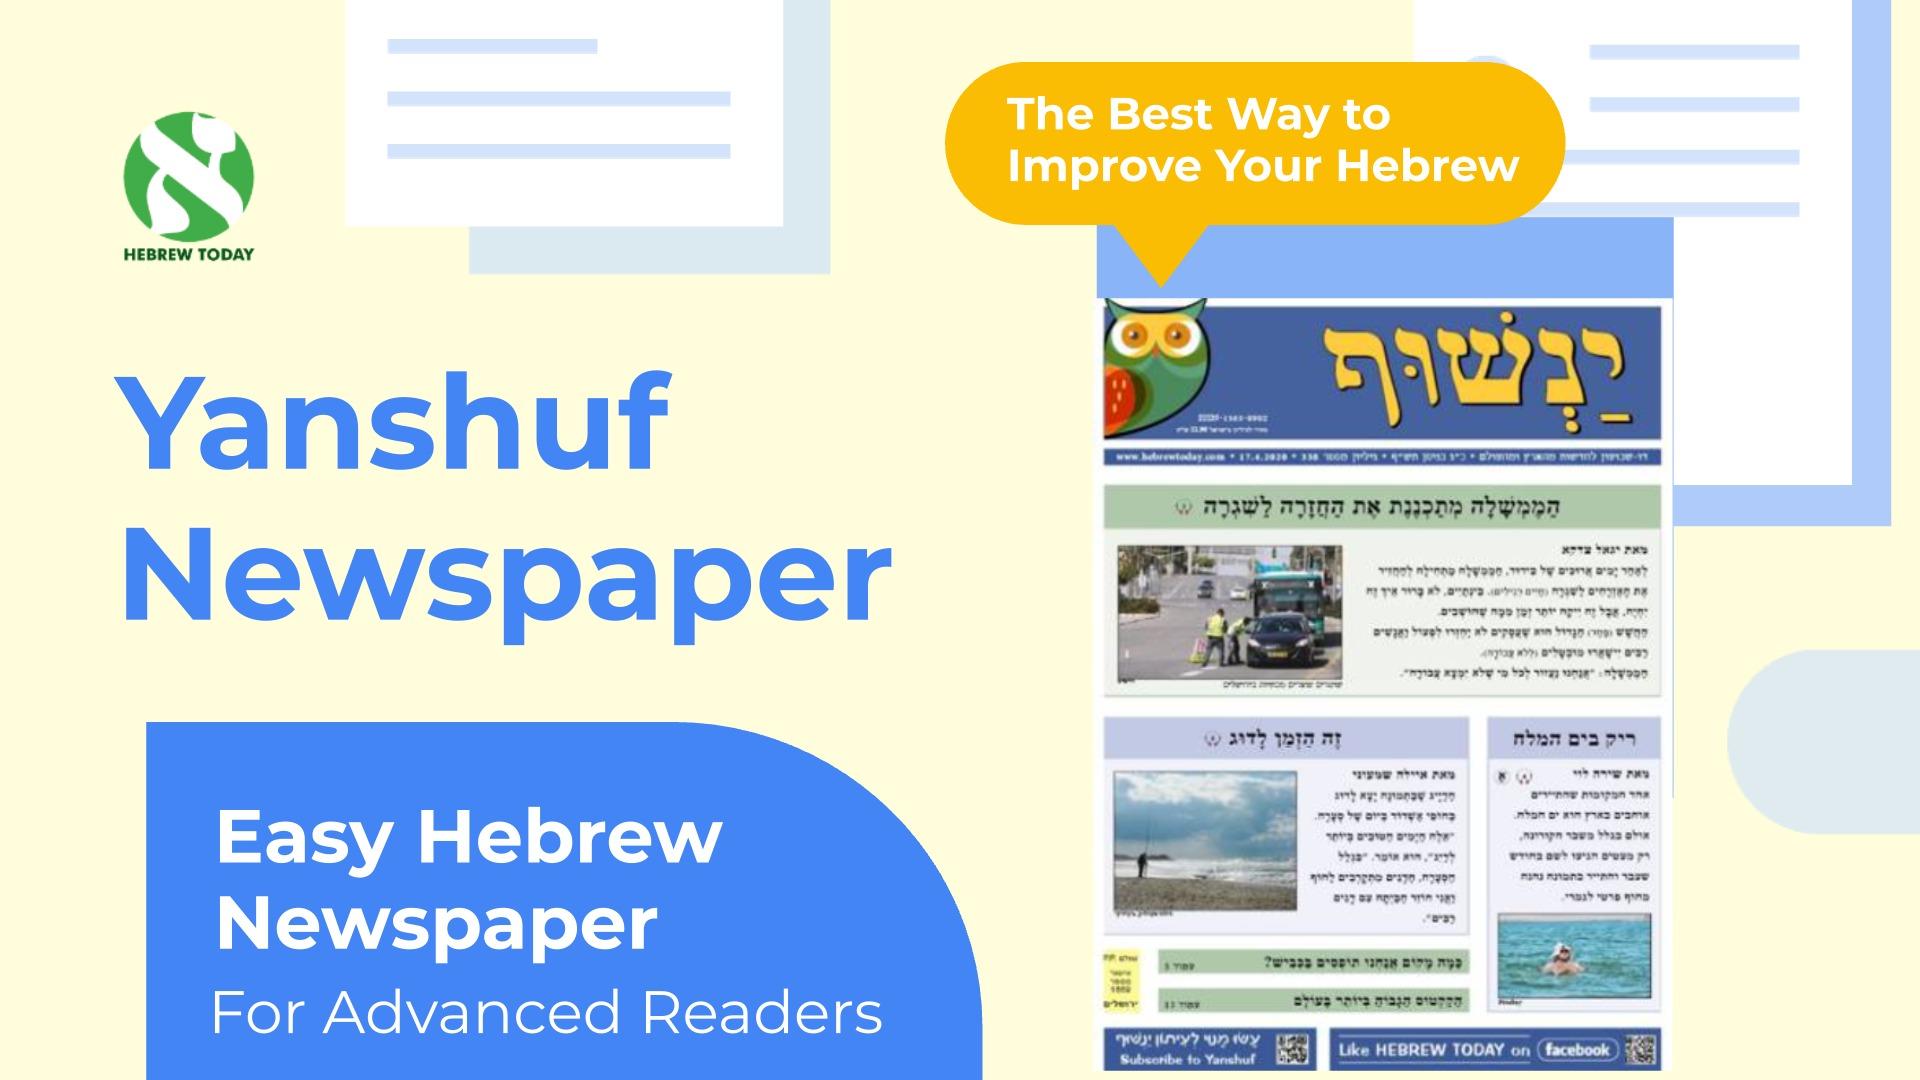 Yanshuf Newspaper - Video